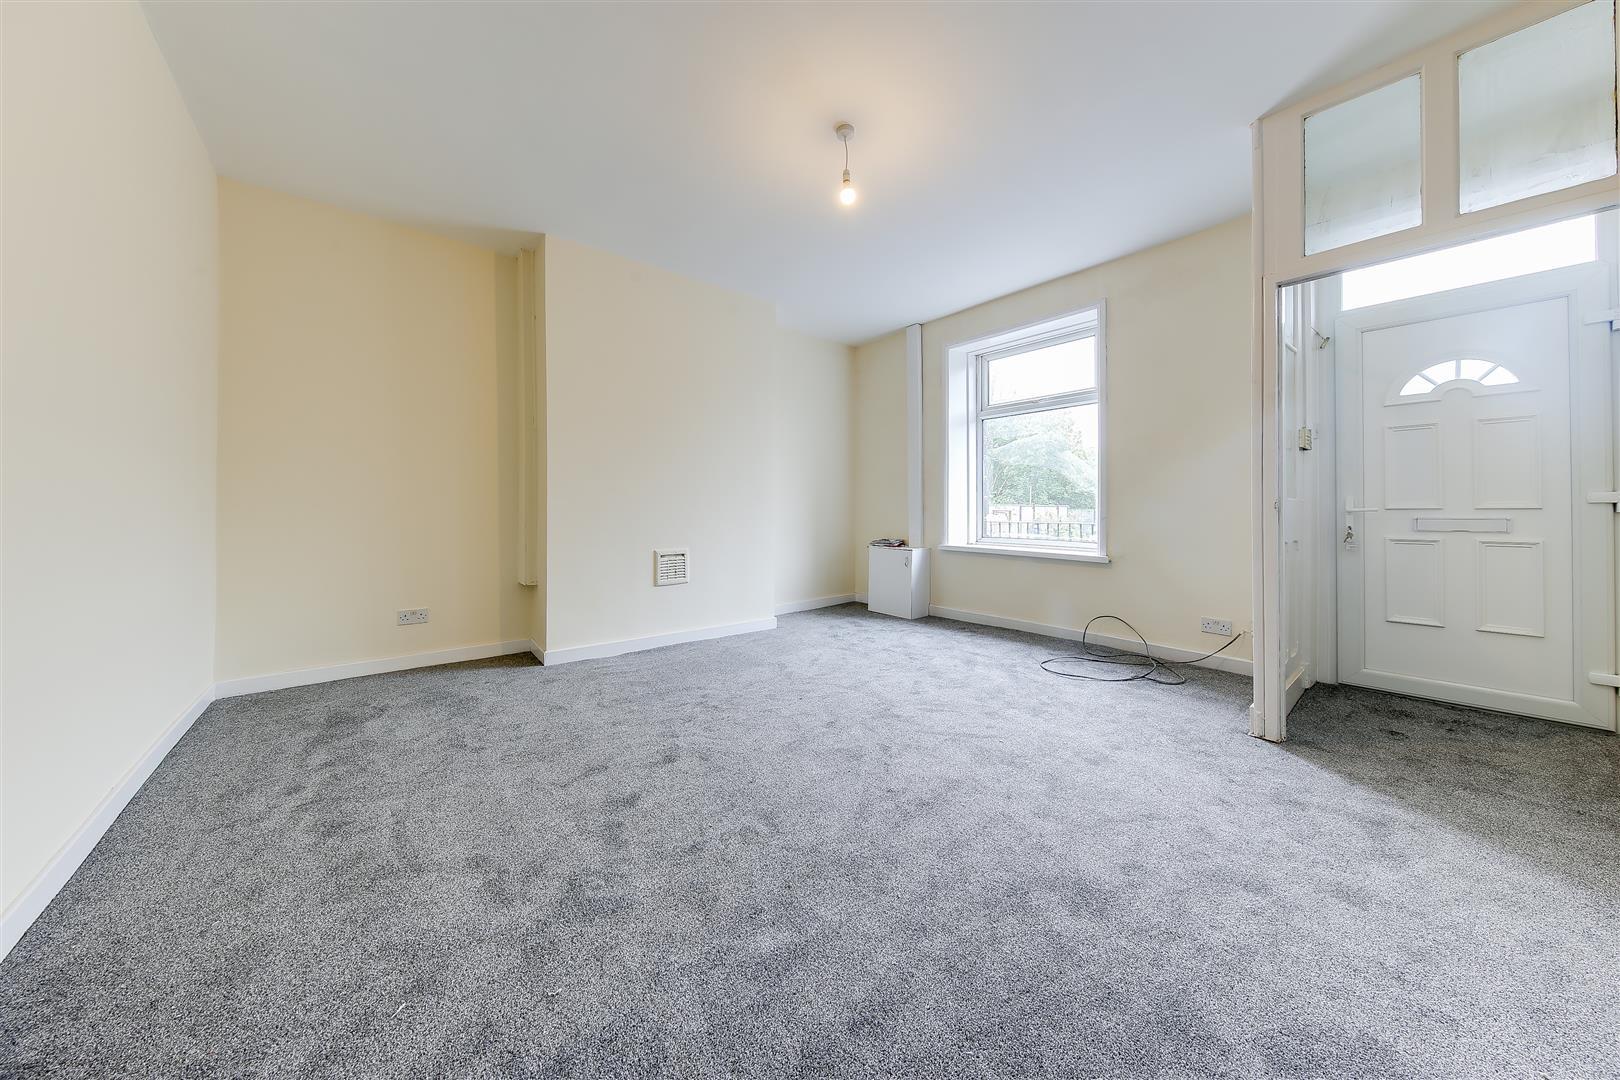 2 Bedrooms Property for sale in Burnley Road East, Waterfoot, Rossendale